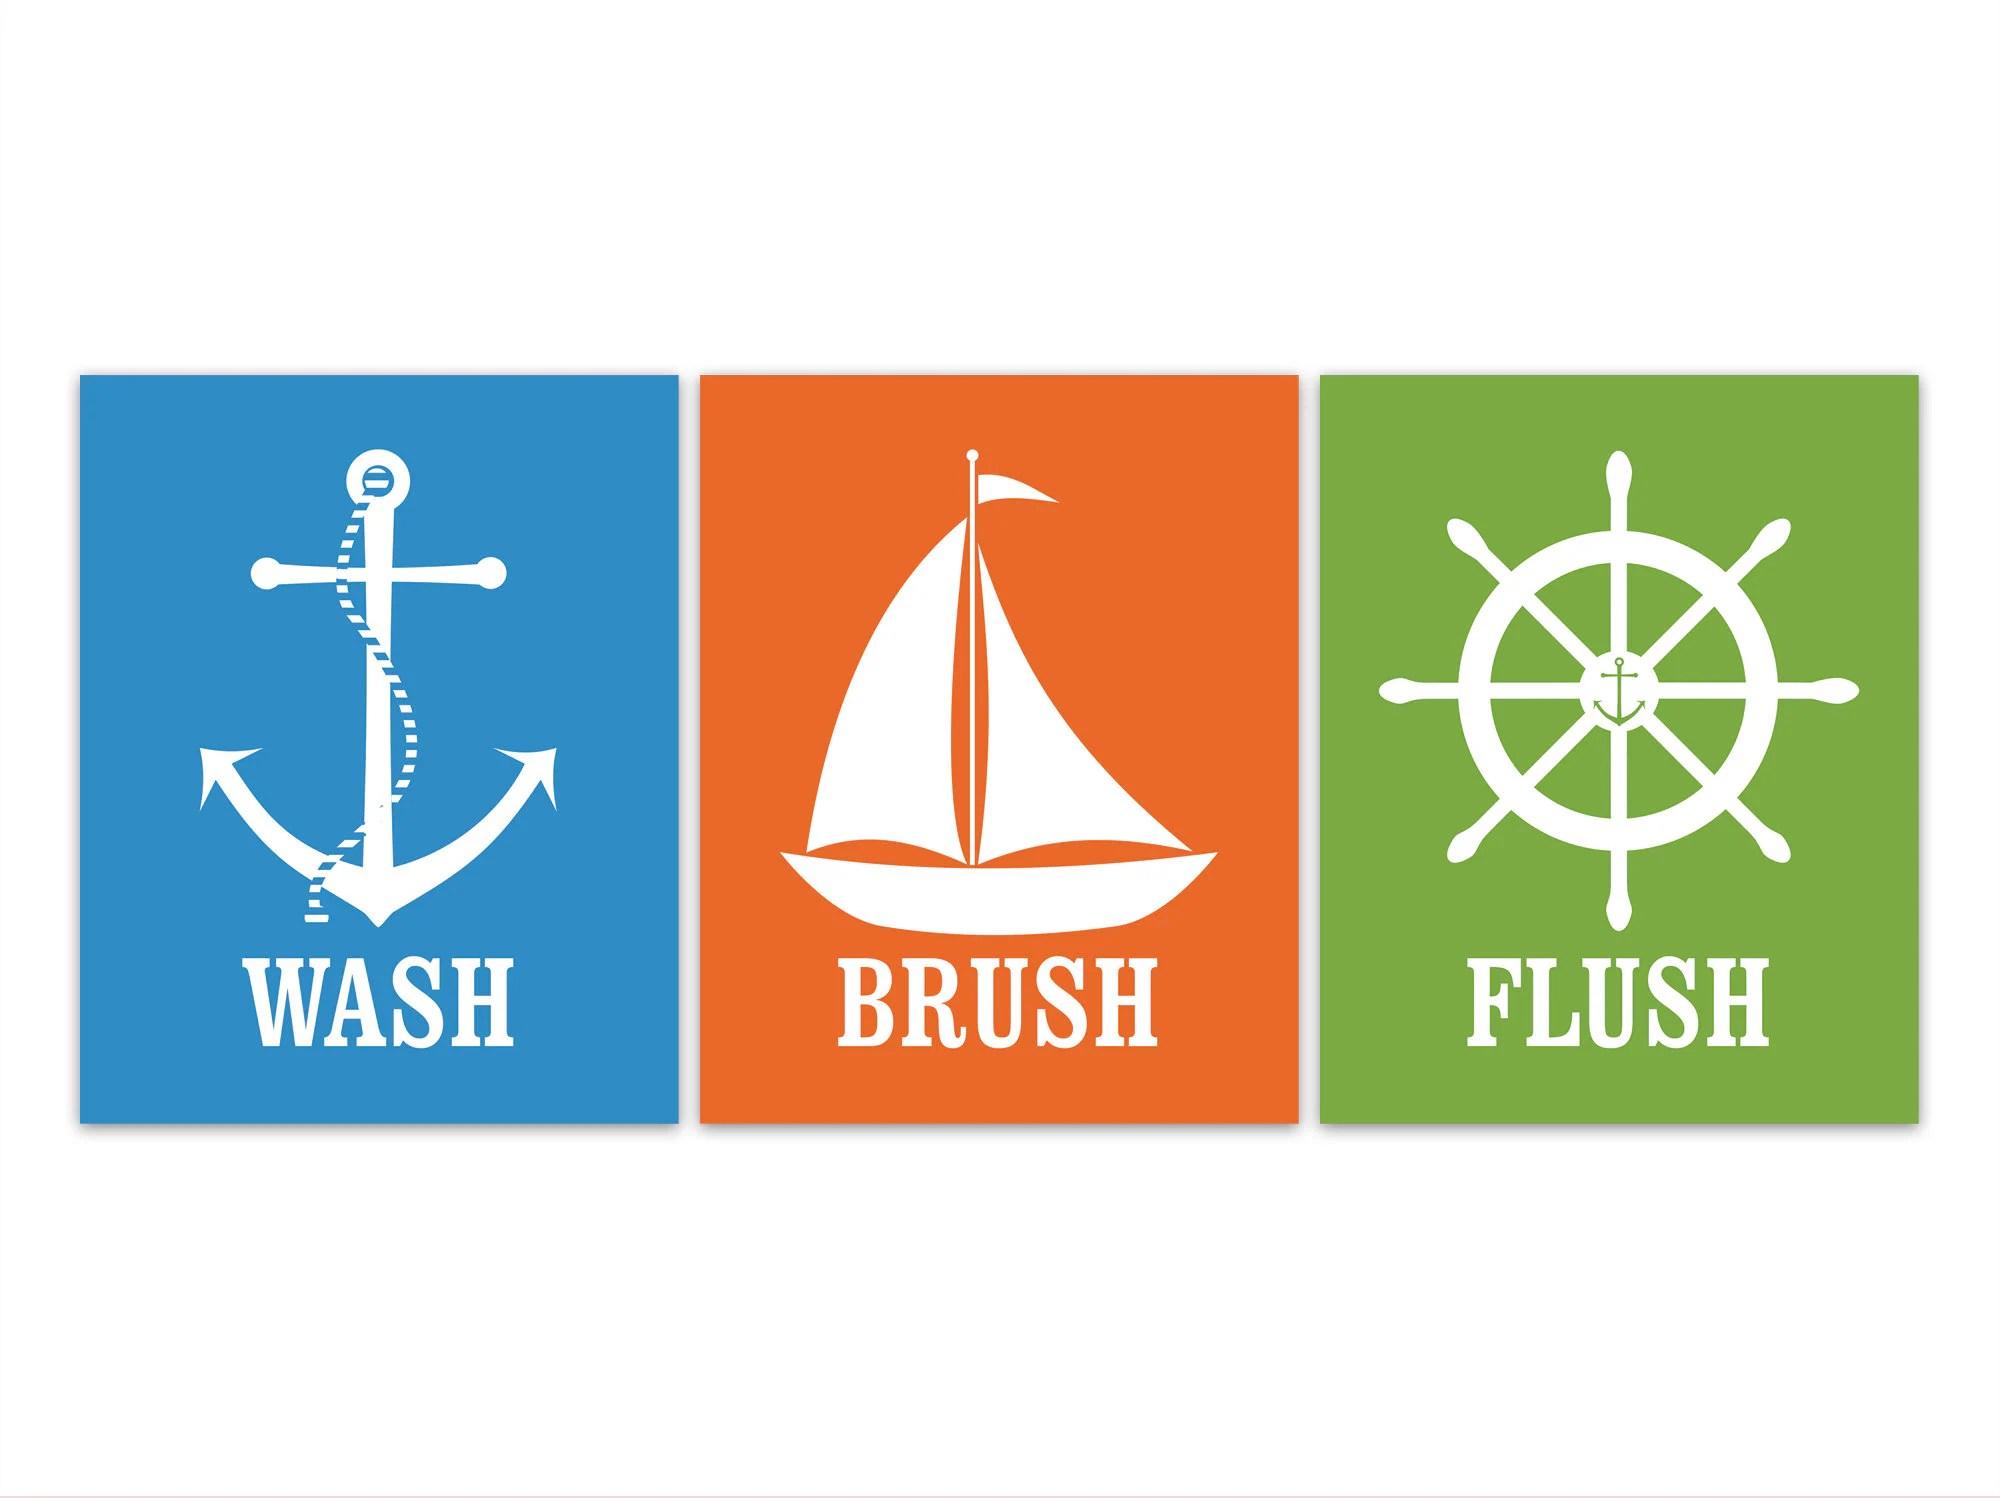 Wash Brush Flush Bathroom Rules Canvas Or Prints Nautical